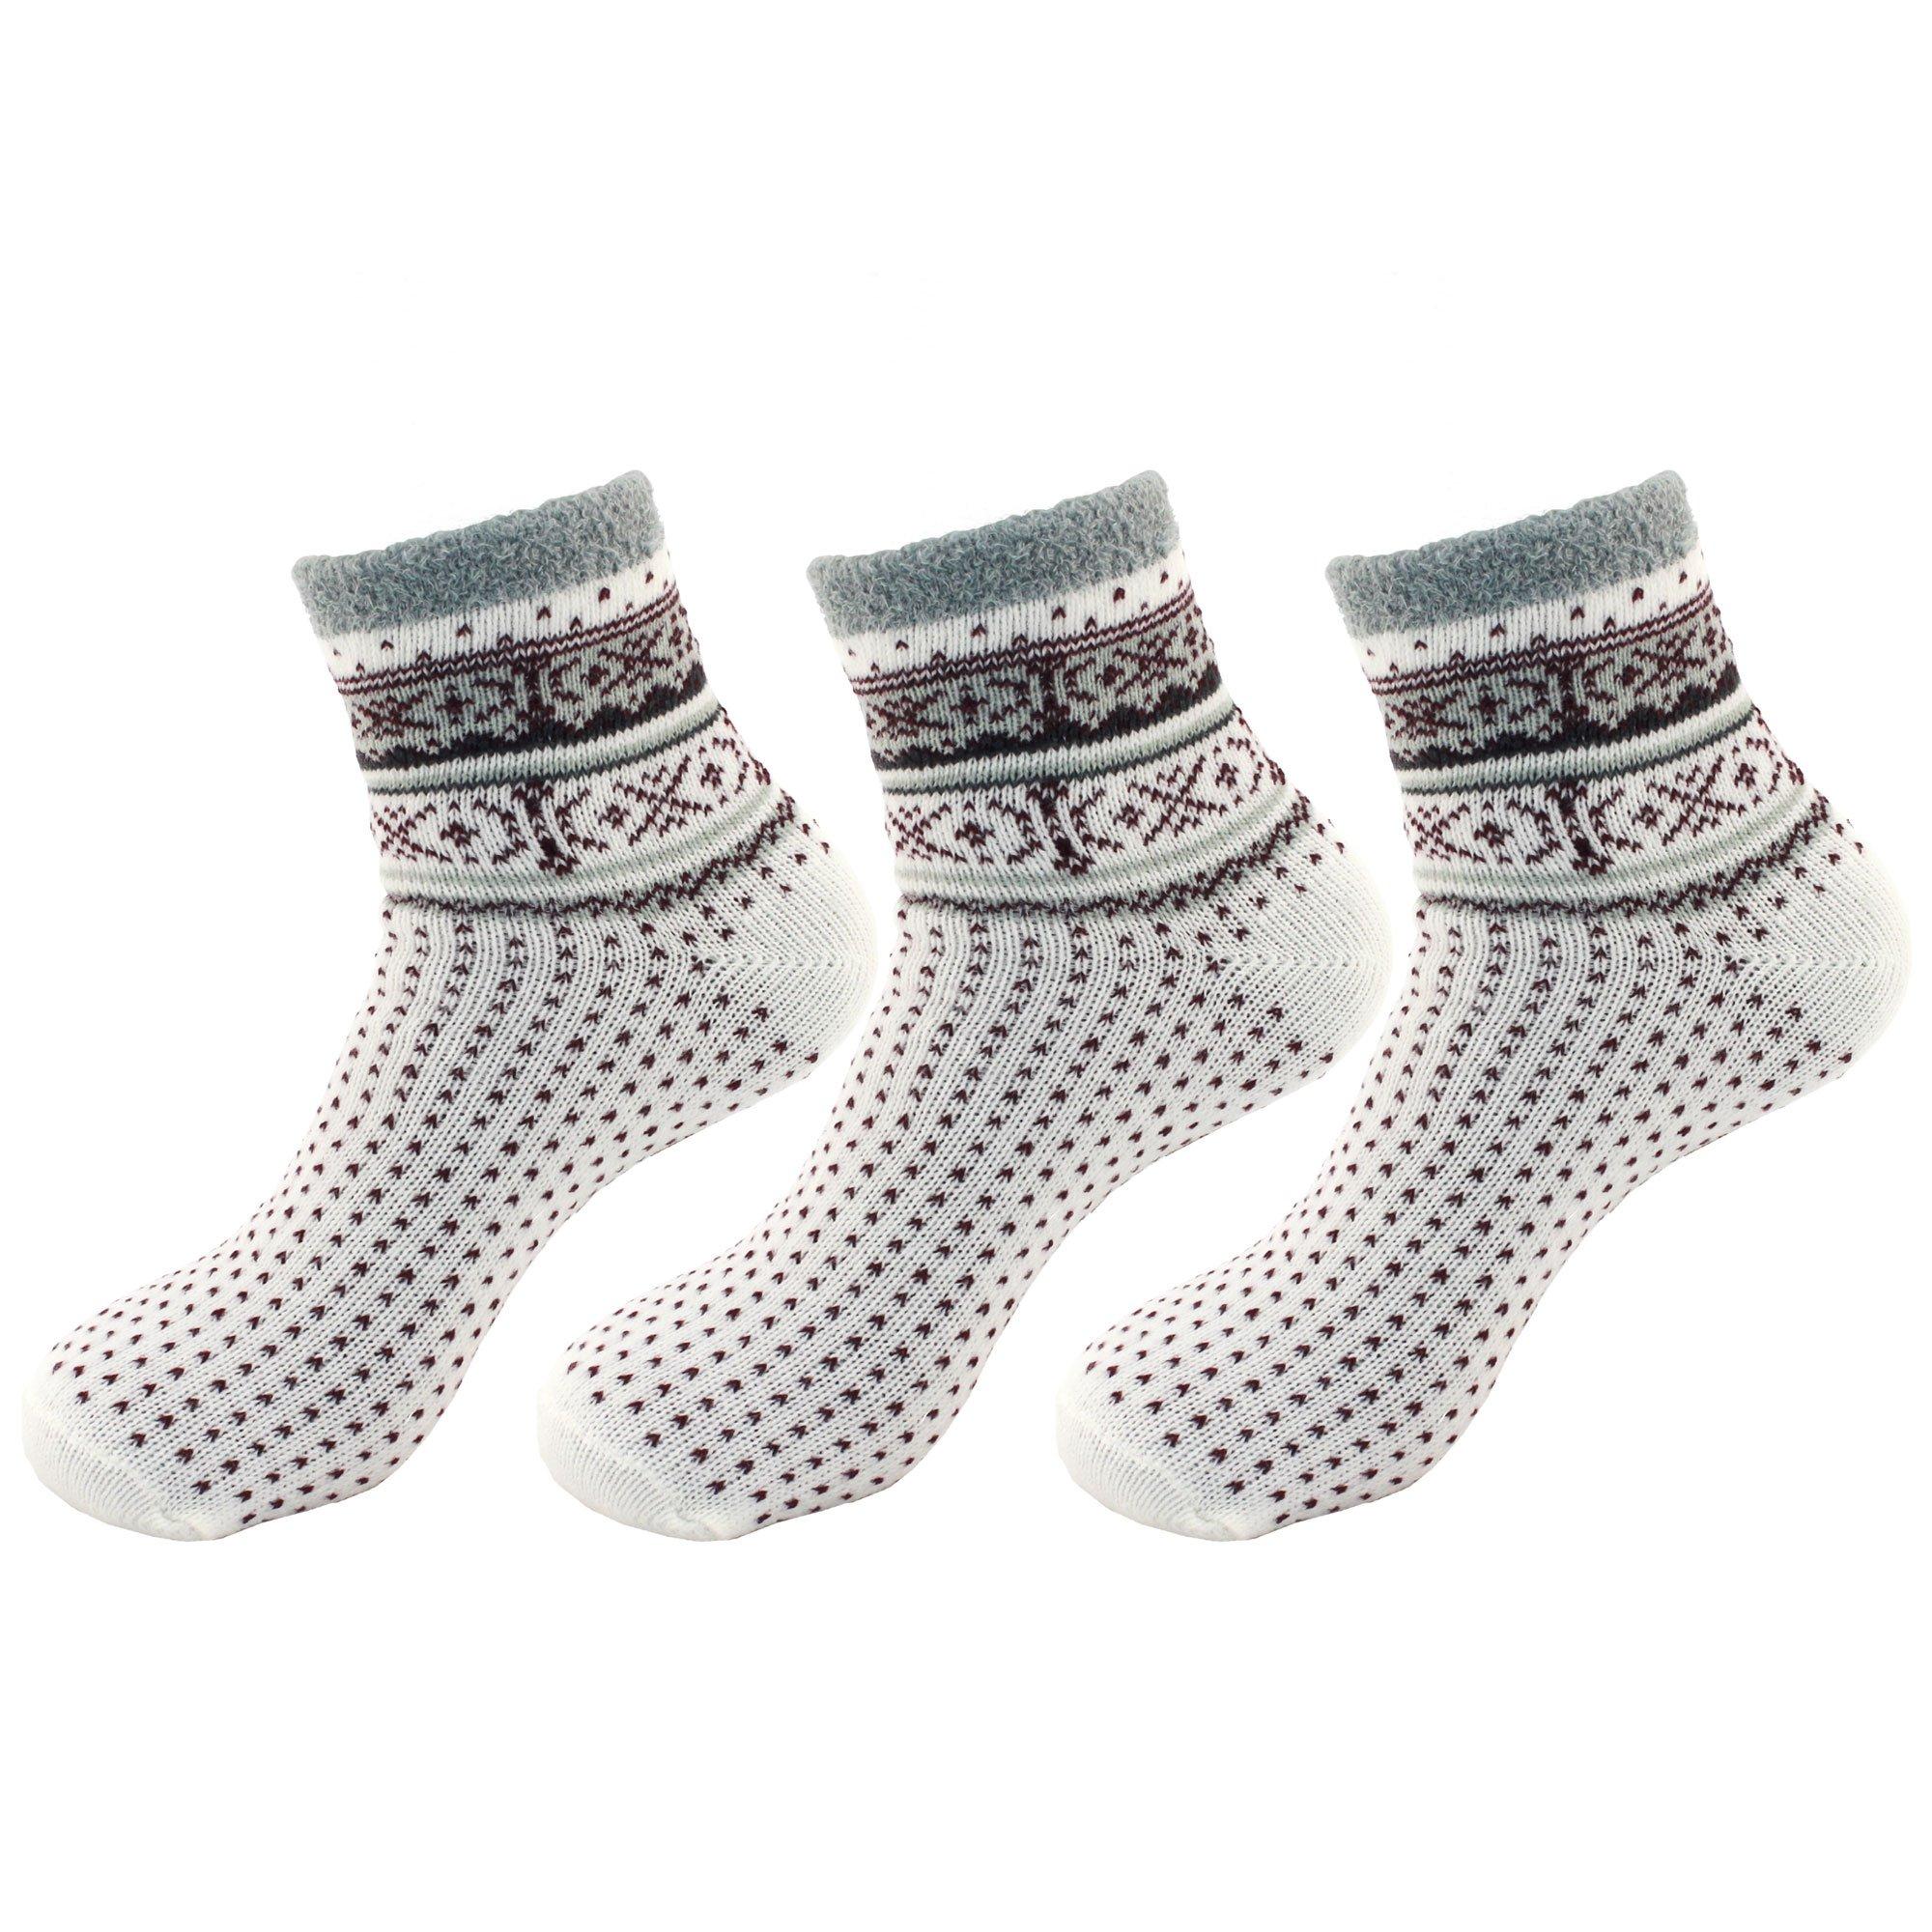 BambooMN Women's Super Soft Warm Cozy Fuzzy Socks Assortments